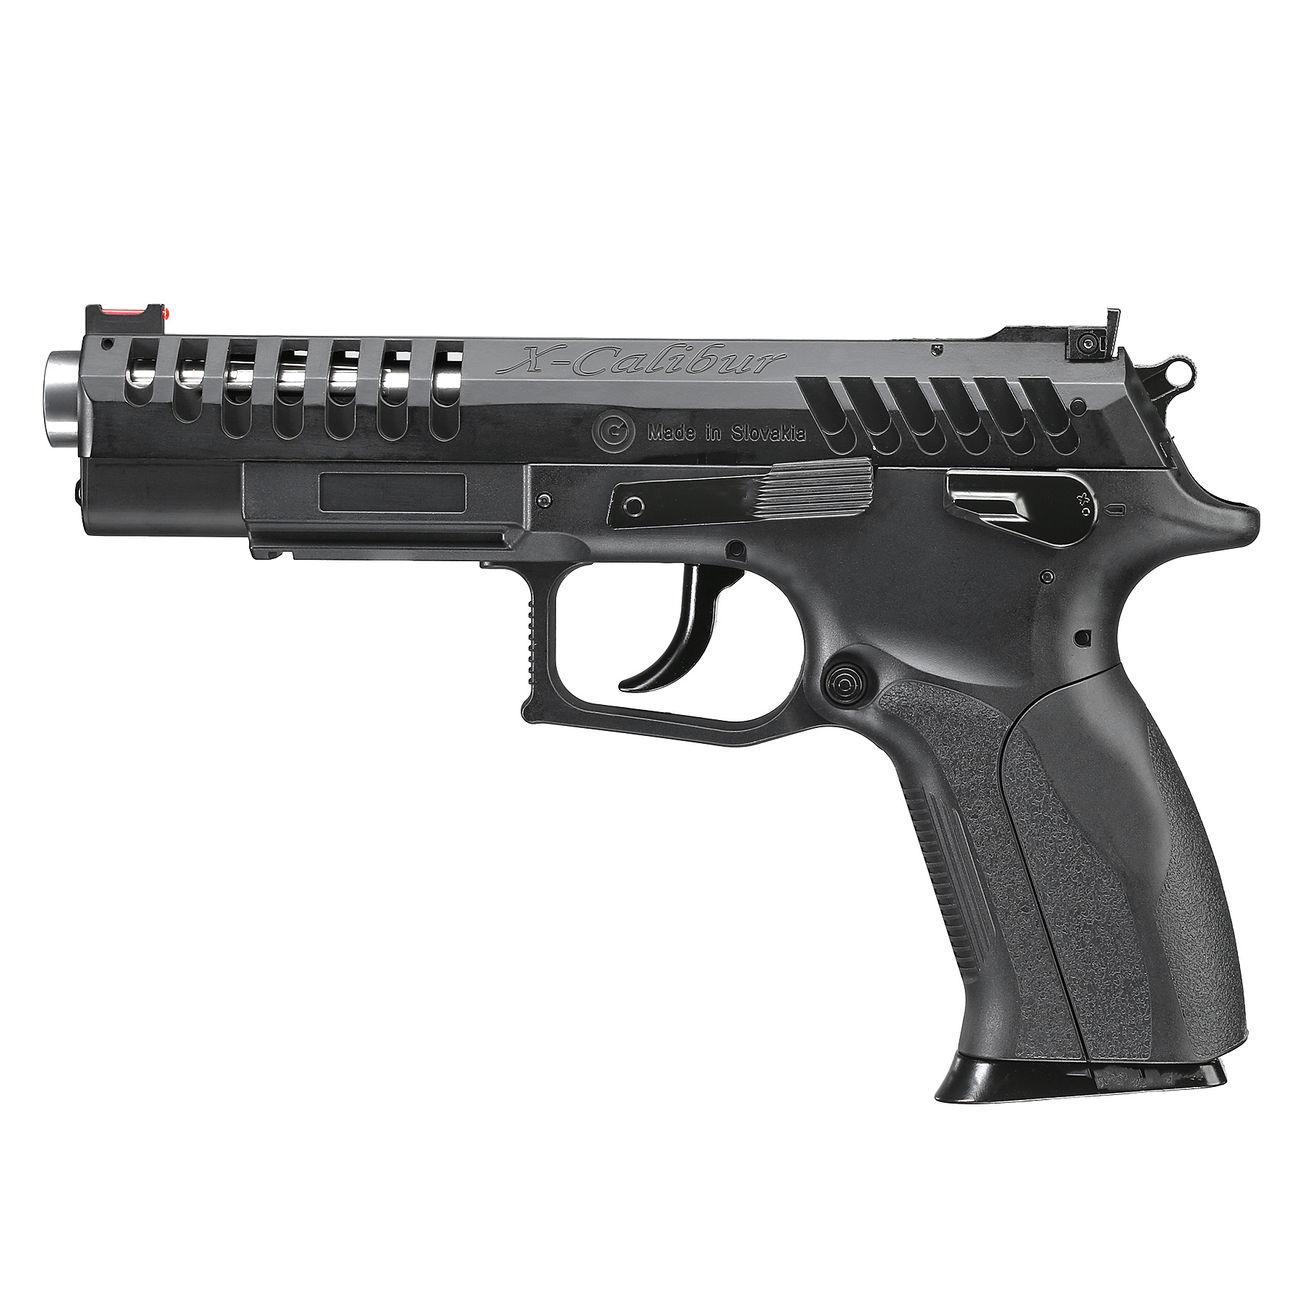 Grandpower X-Calibur CO2 Luftpistole BB Kal  4,5mm Stahl BBs schwarz